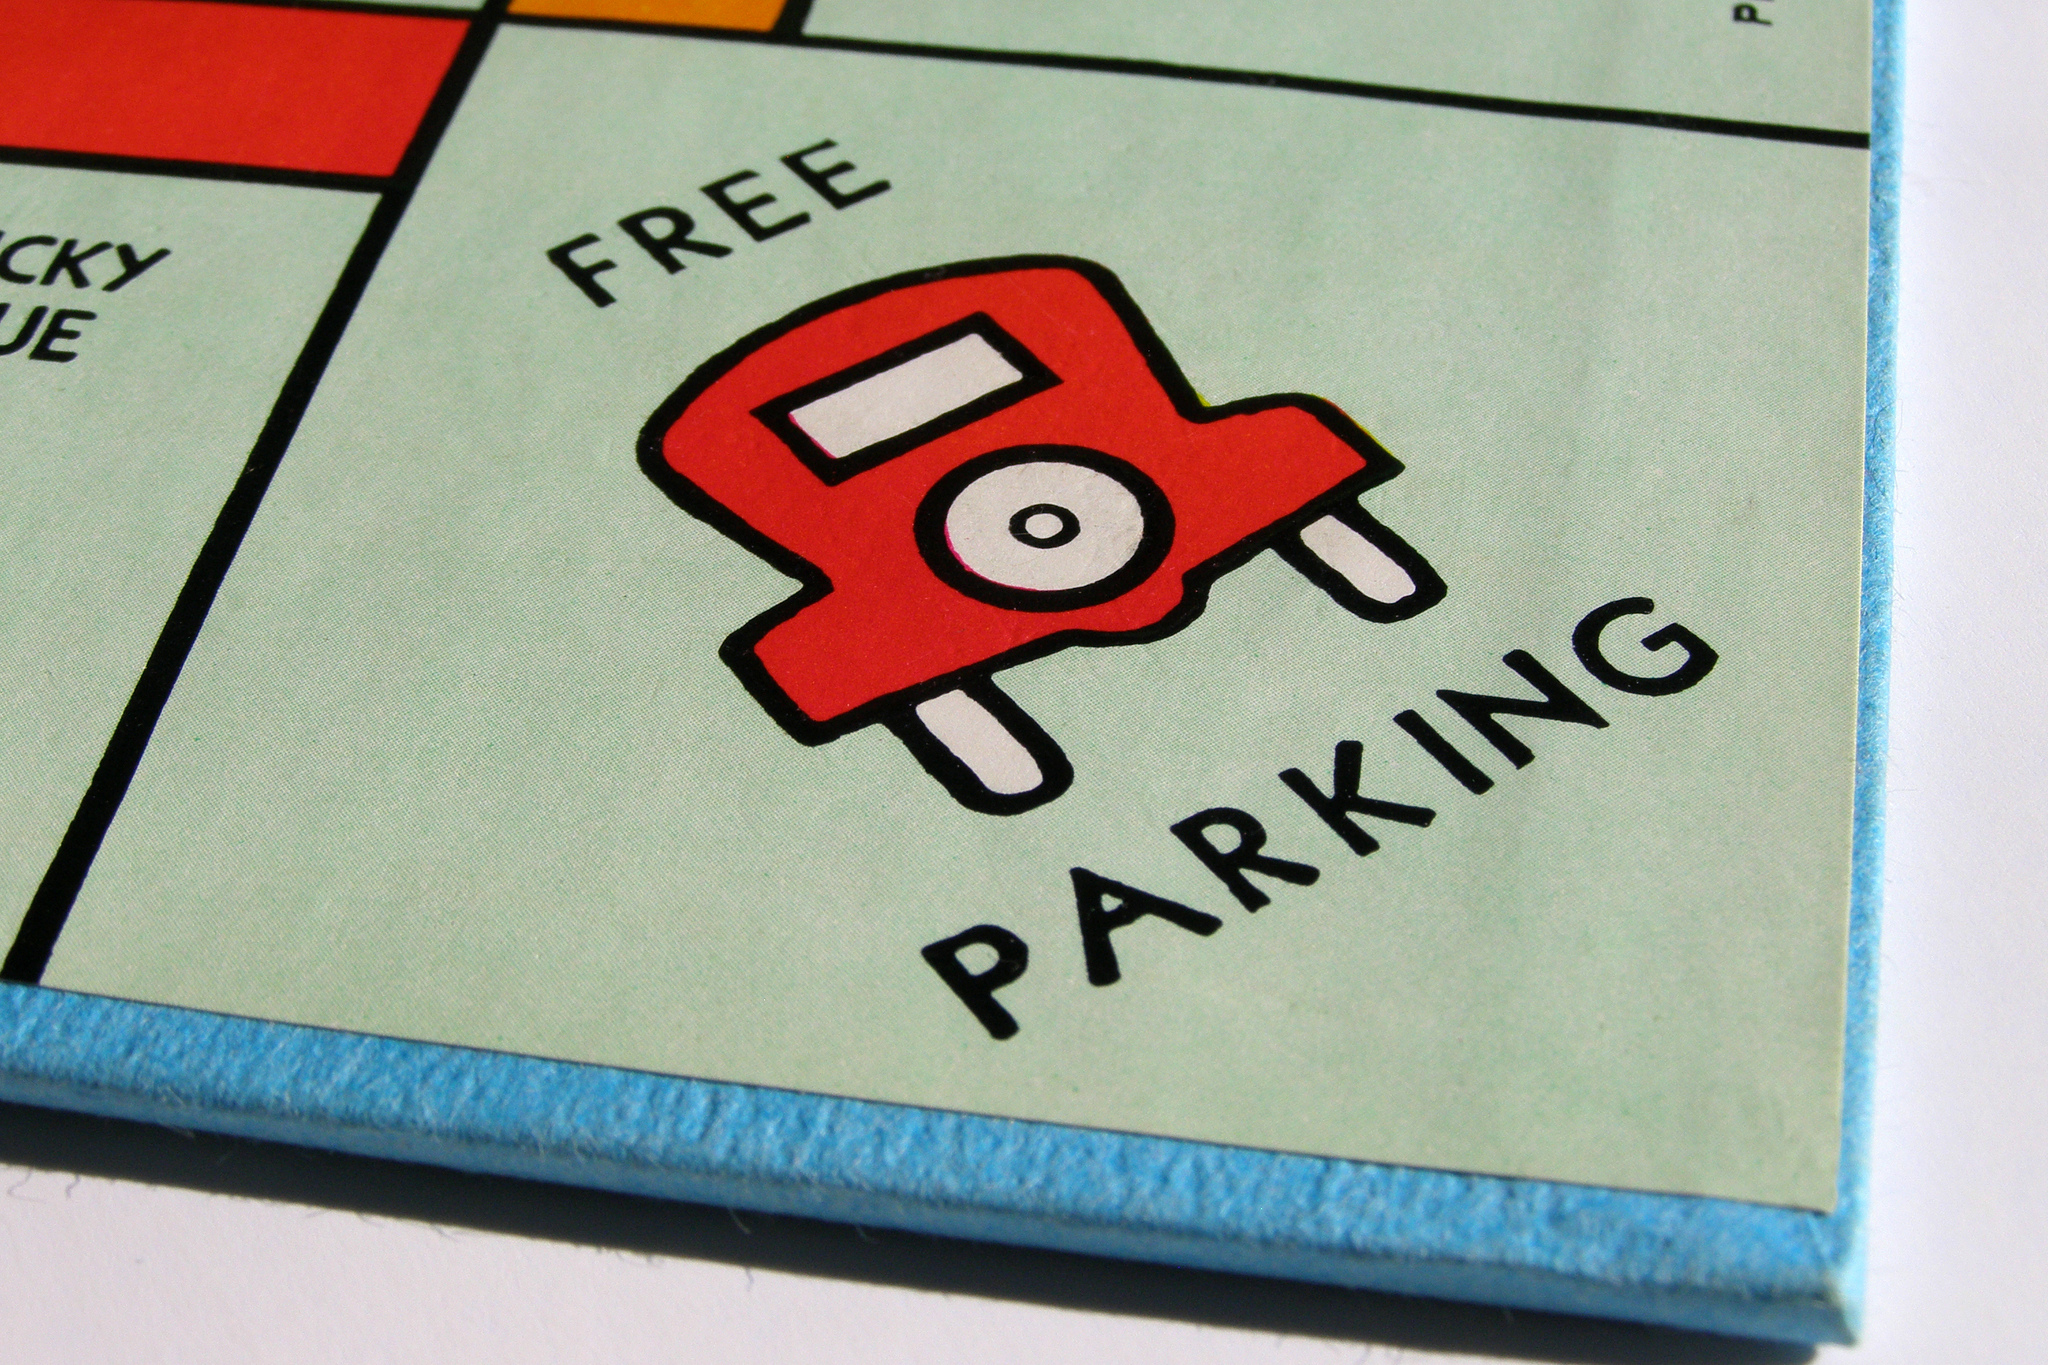 Free parking Monopoly board